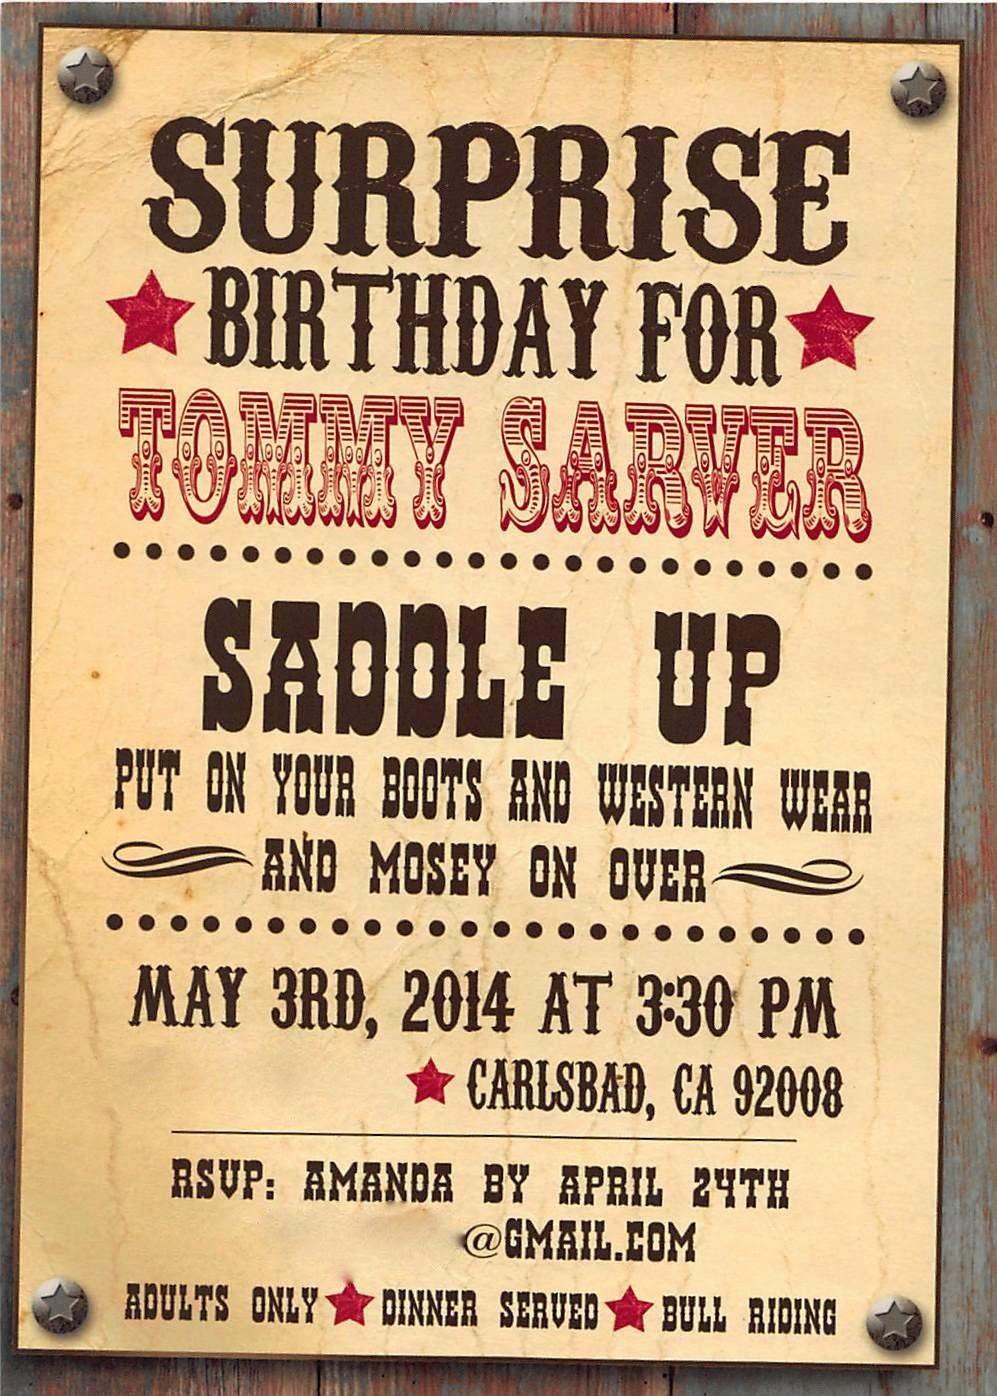 Amanda Sarver: Happy Birthday Tommy Cowboy/Western Them Blog ...